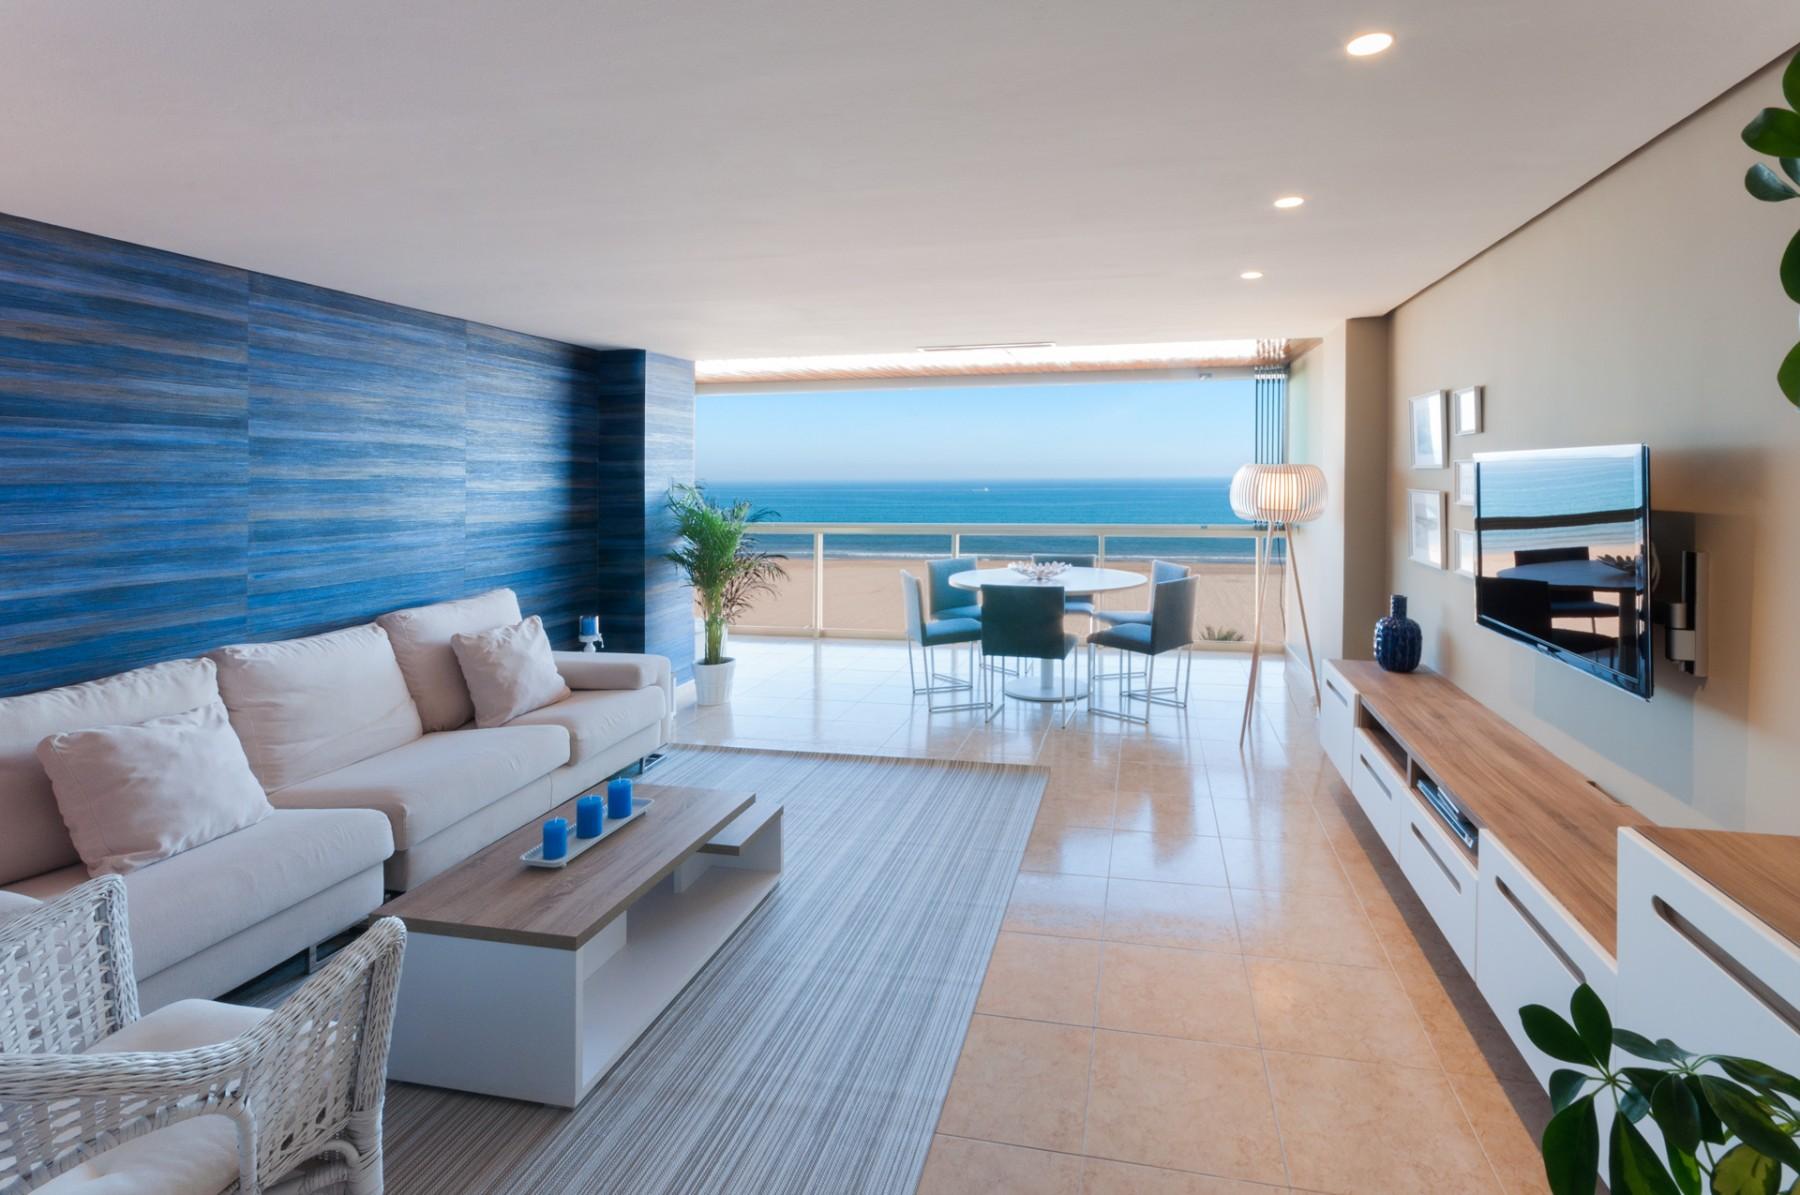 Apartamentos en playa de gand a 02 ag bermudas 6 premium - Apartamentos en gandia playa ...